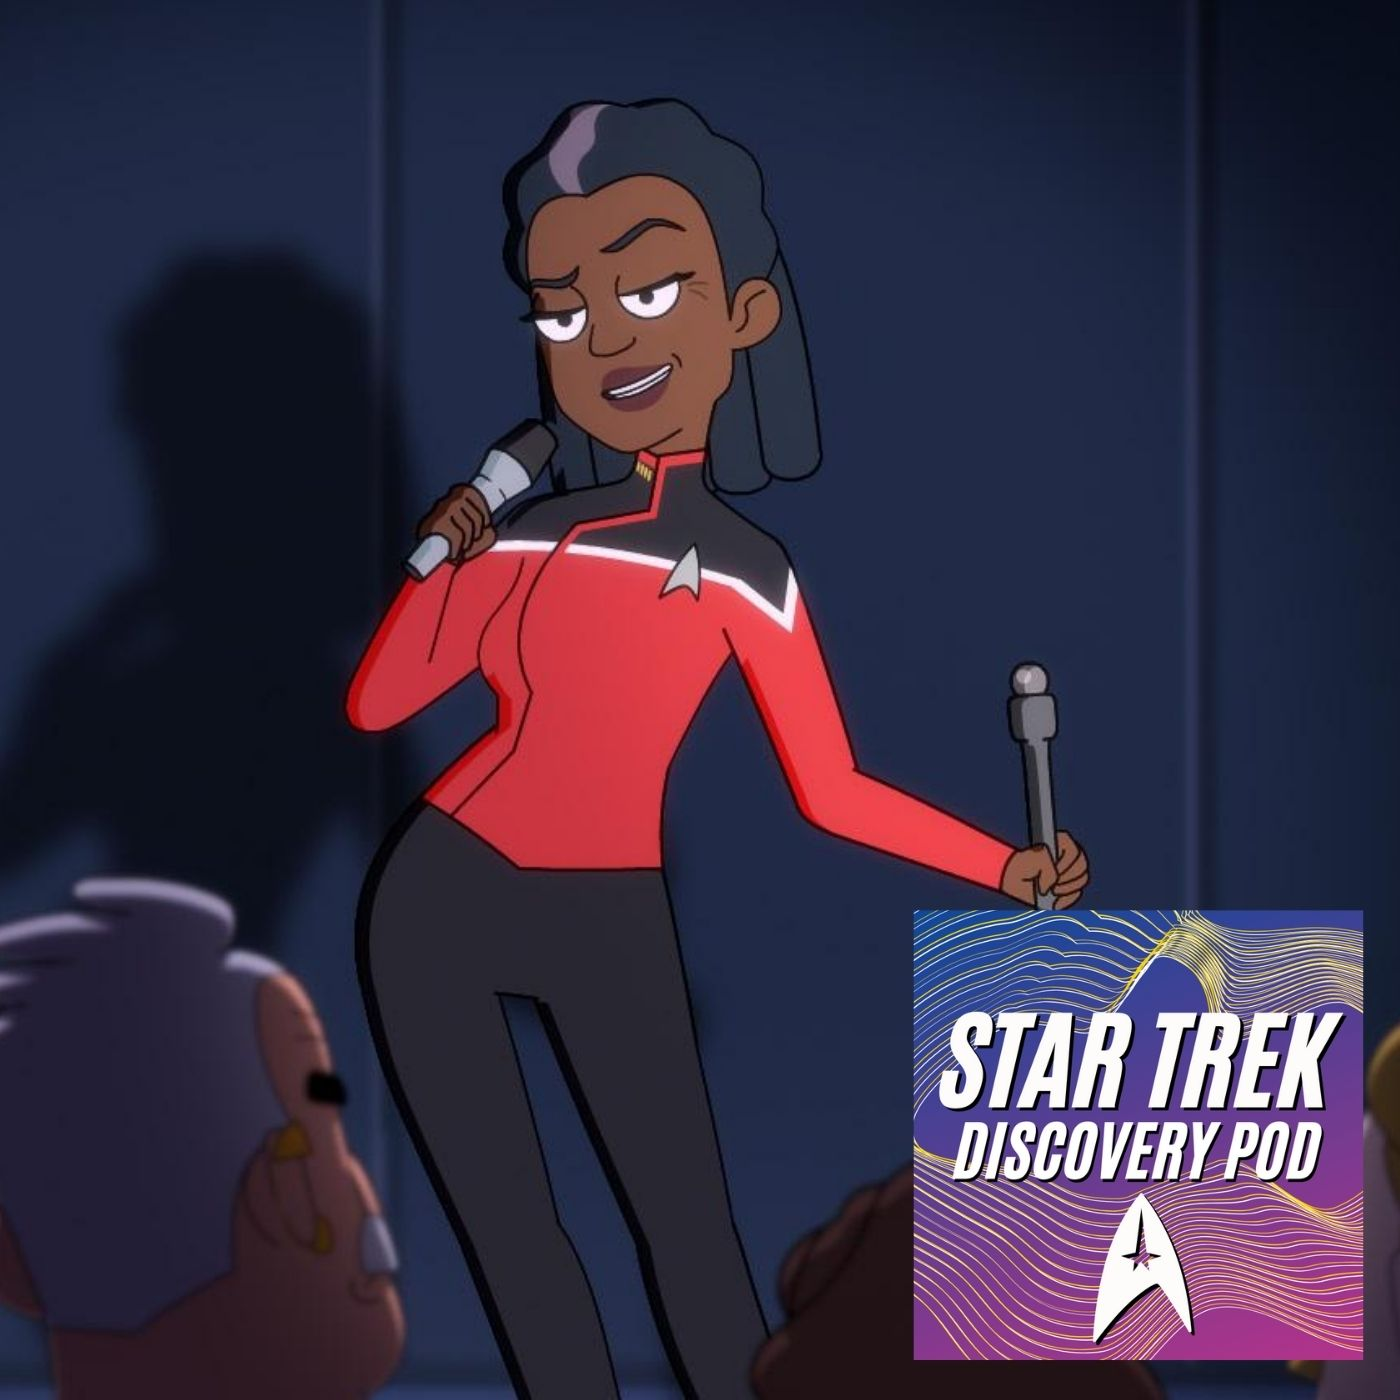 Star Trek: Lower Decks Episode 4 'Moist Vessel' Review (S01E04)